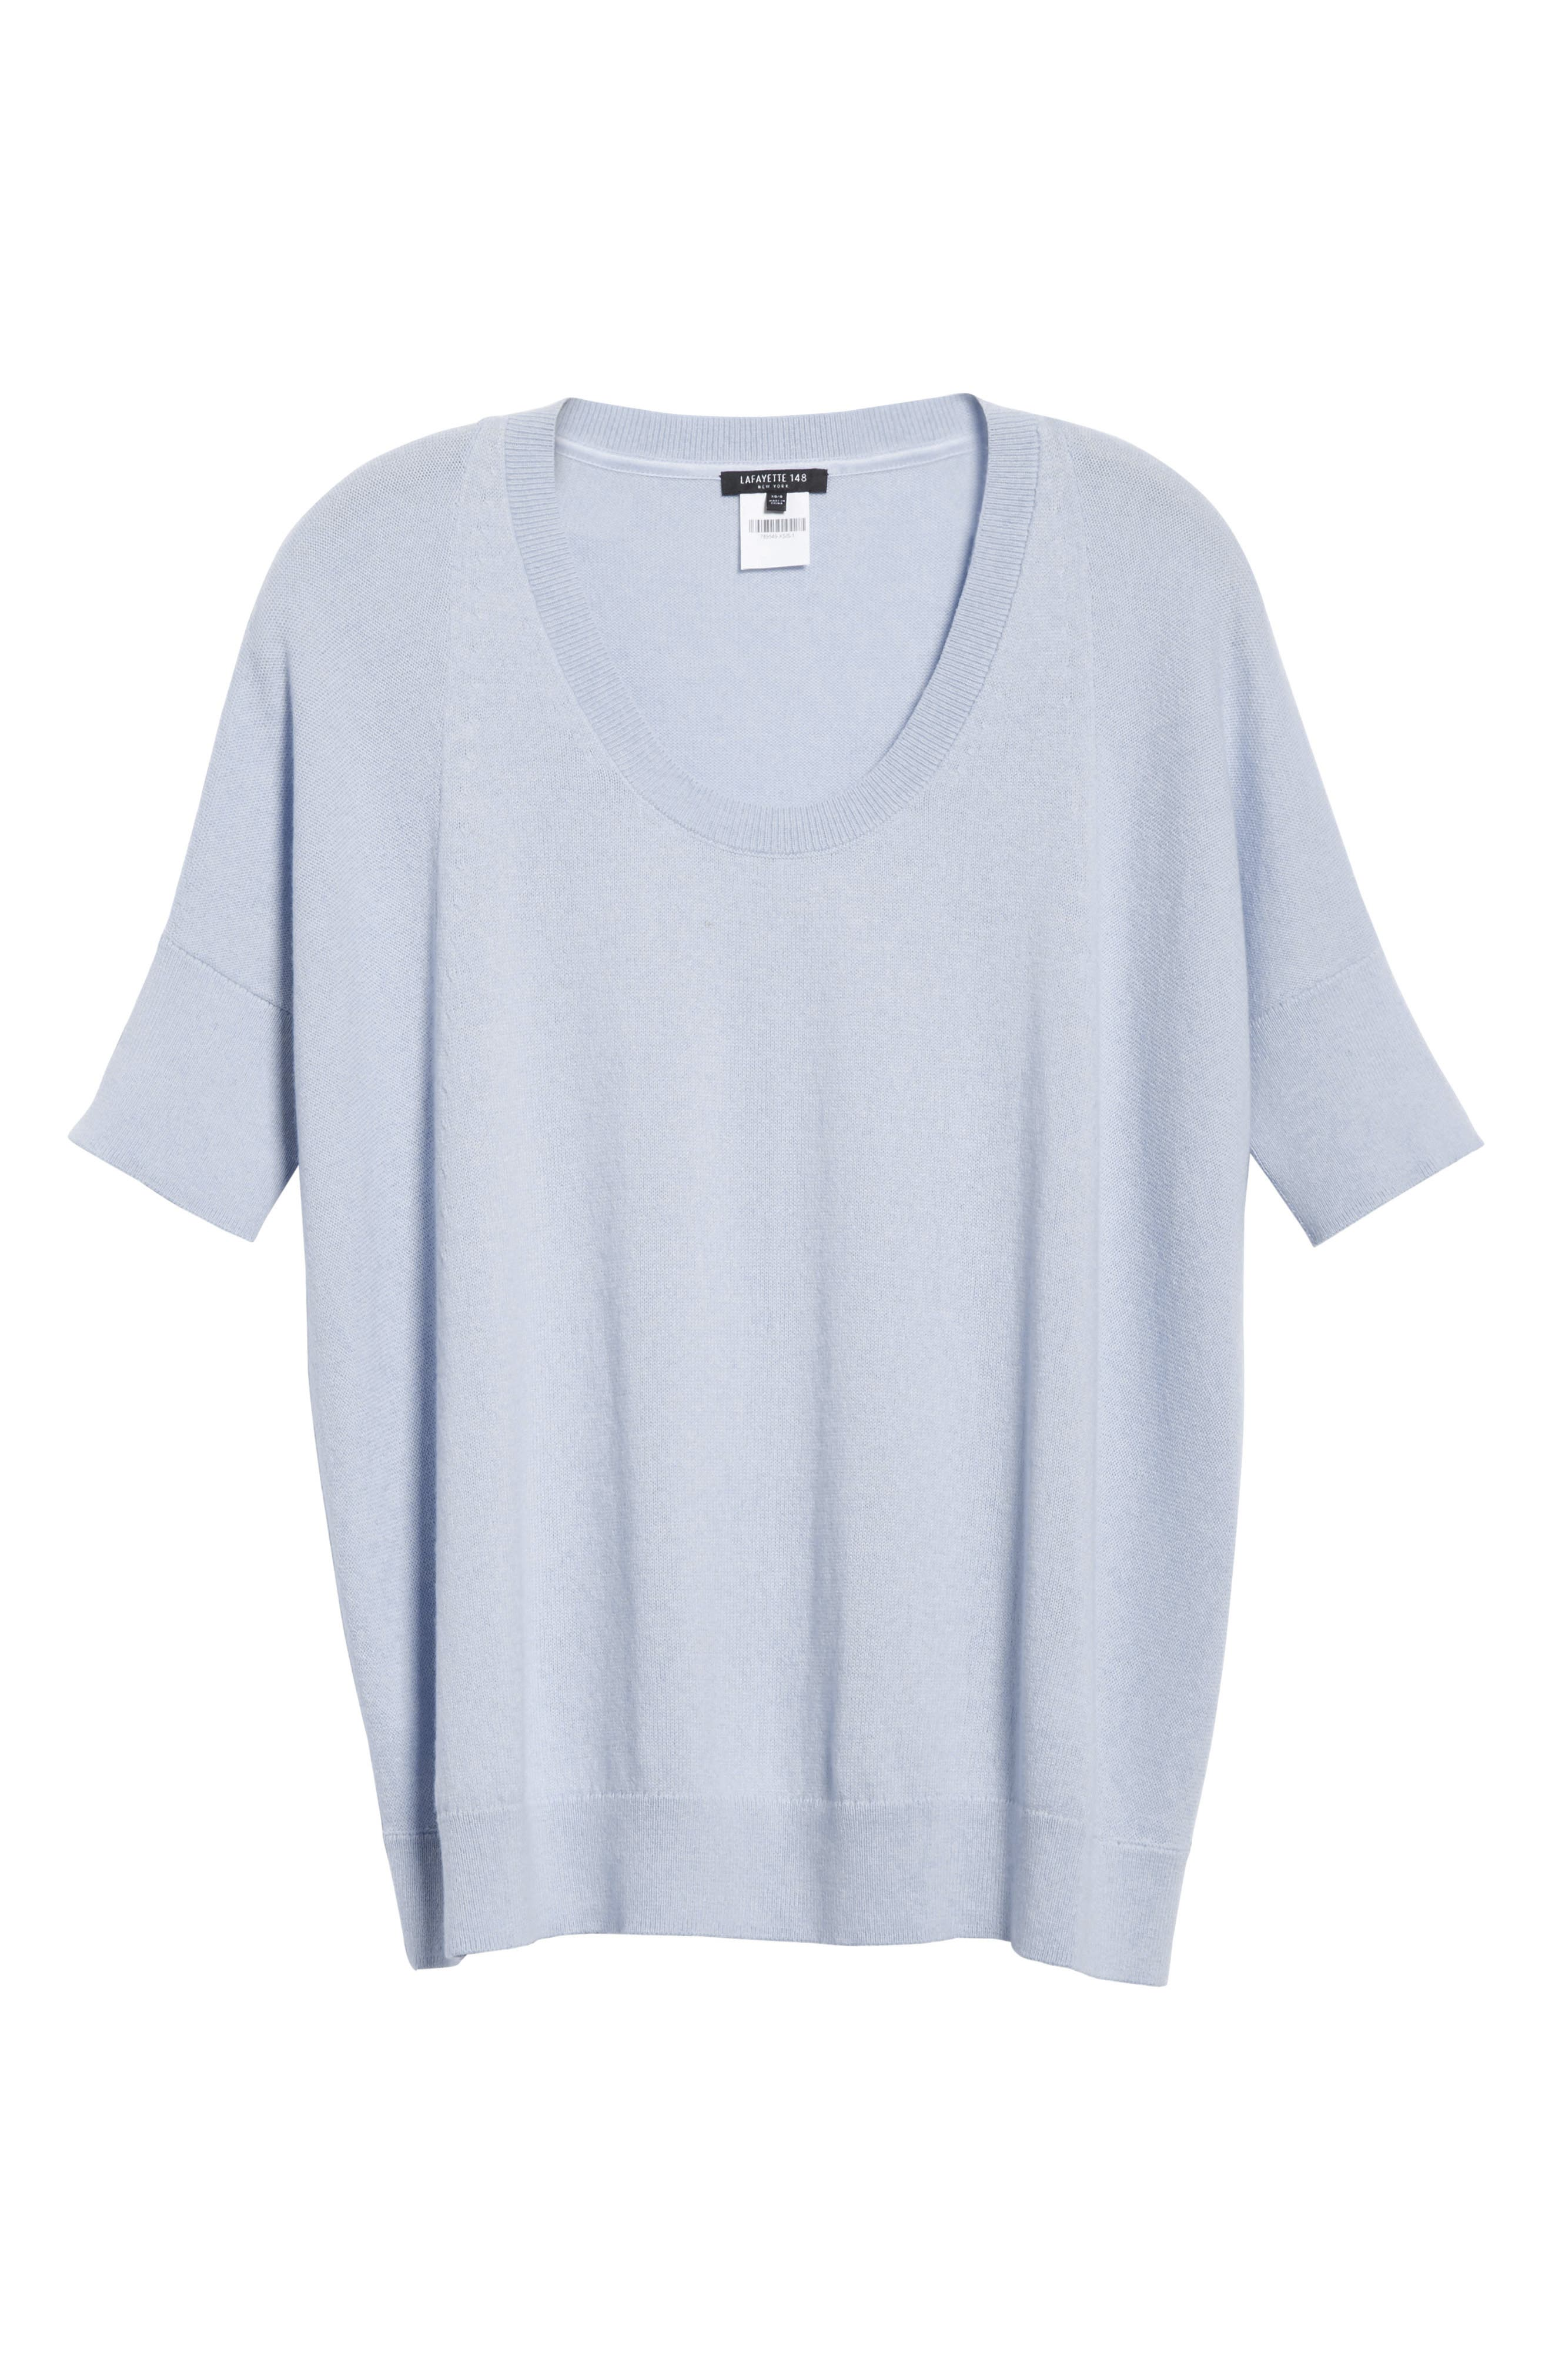 Cotton, Cashmere & Silk Oversized Scoop Neck Sweater,                             Alternate thumbnail 6, color,                             Pale Blue Melange